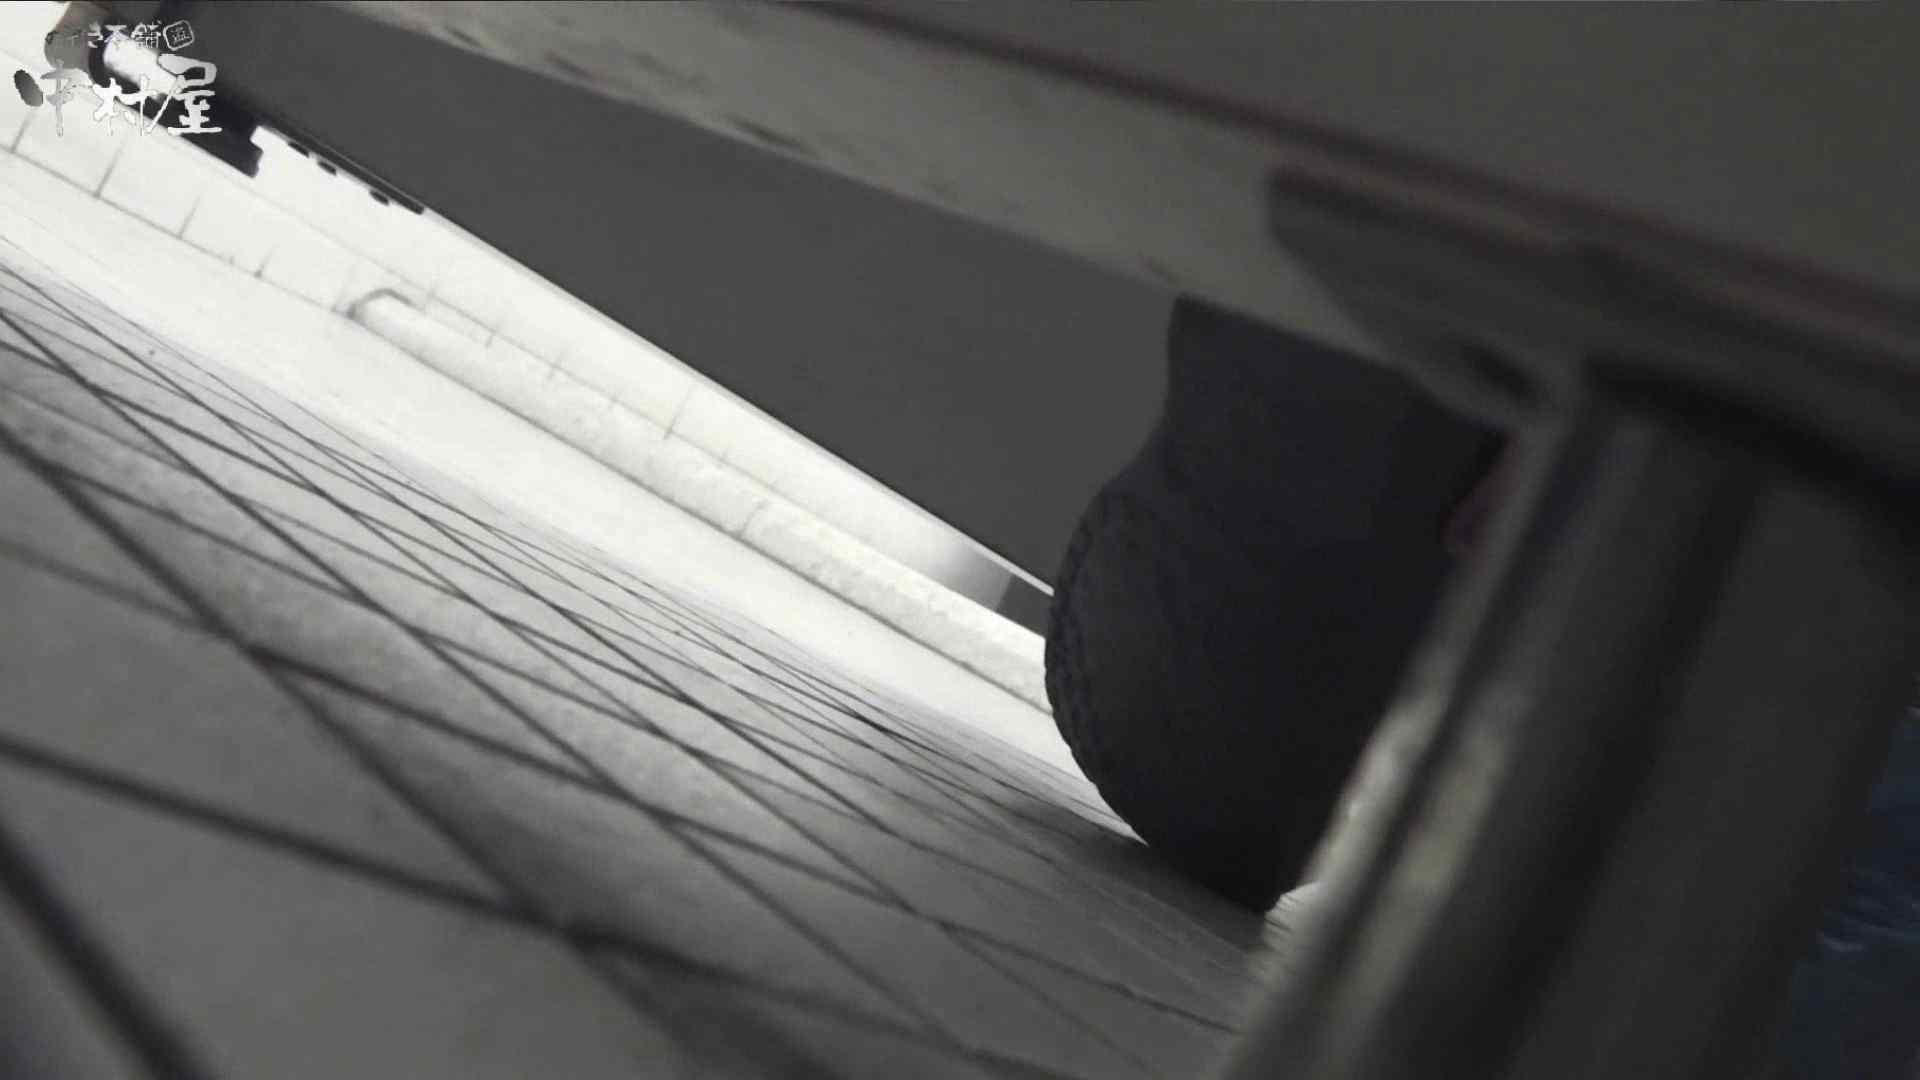 vol.54 命がけ潜伏洗面所! ヲリモノとろりん プライベート 盗撮動画紹介 76連発 3